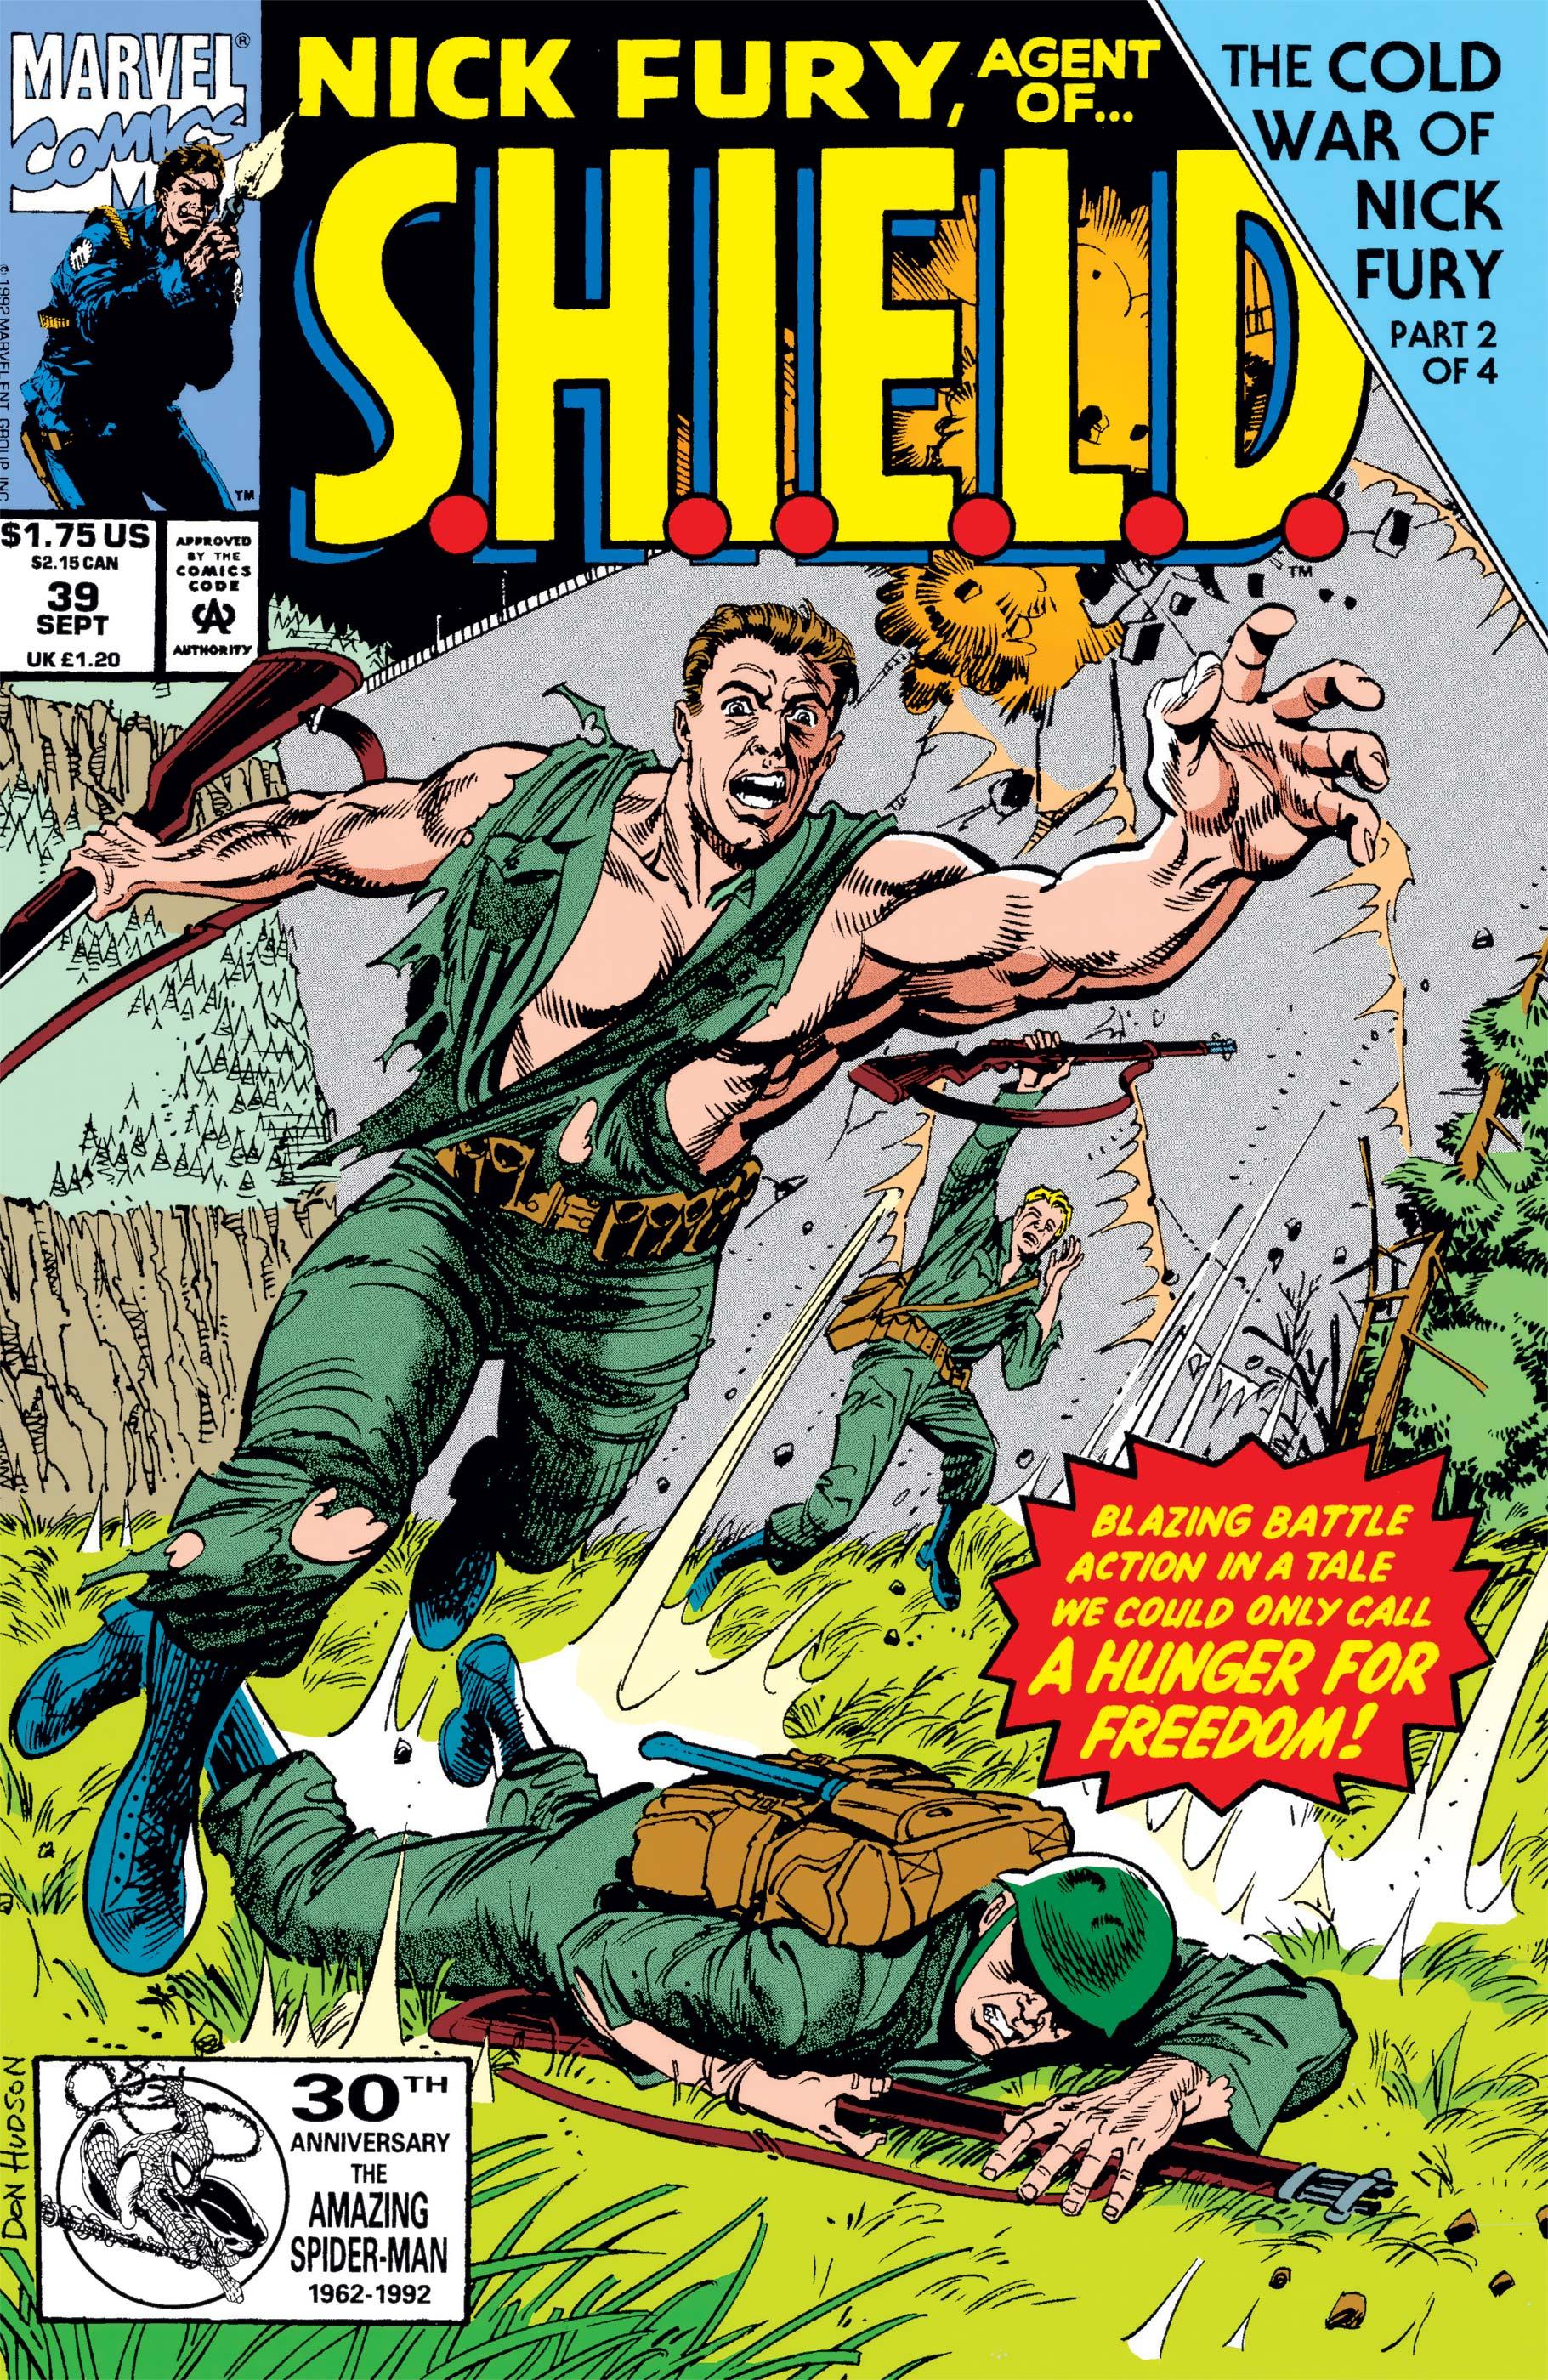 Nick Fury, Agent of S.H.I.E.L.D. (1989) #39